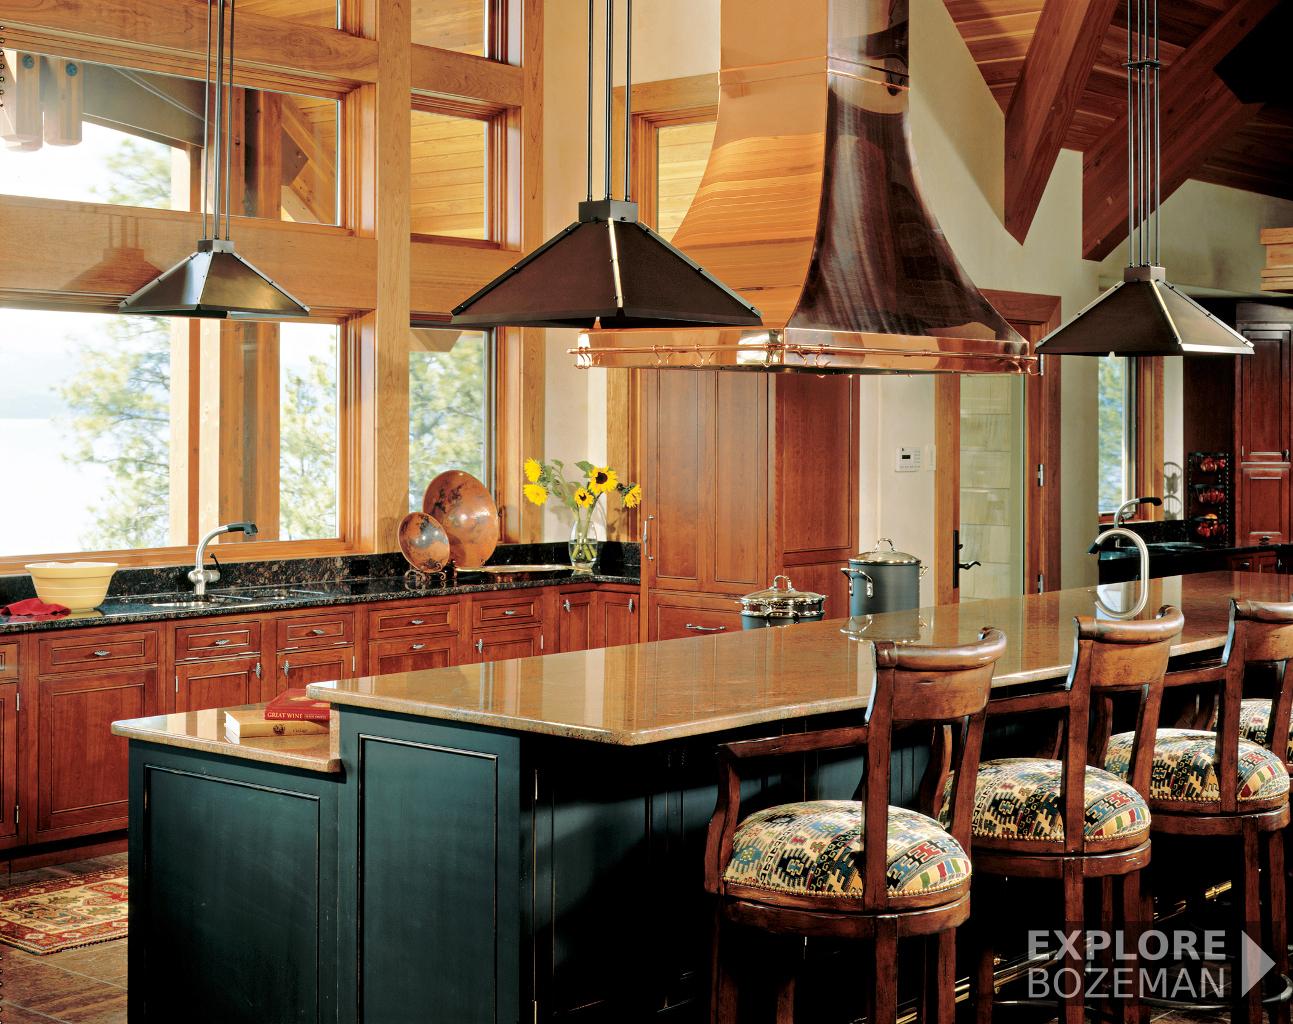 Montana Kitchens  Explore Bozeman